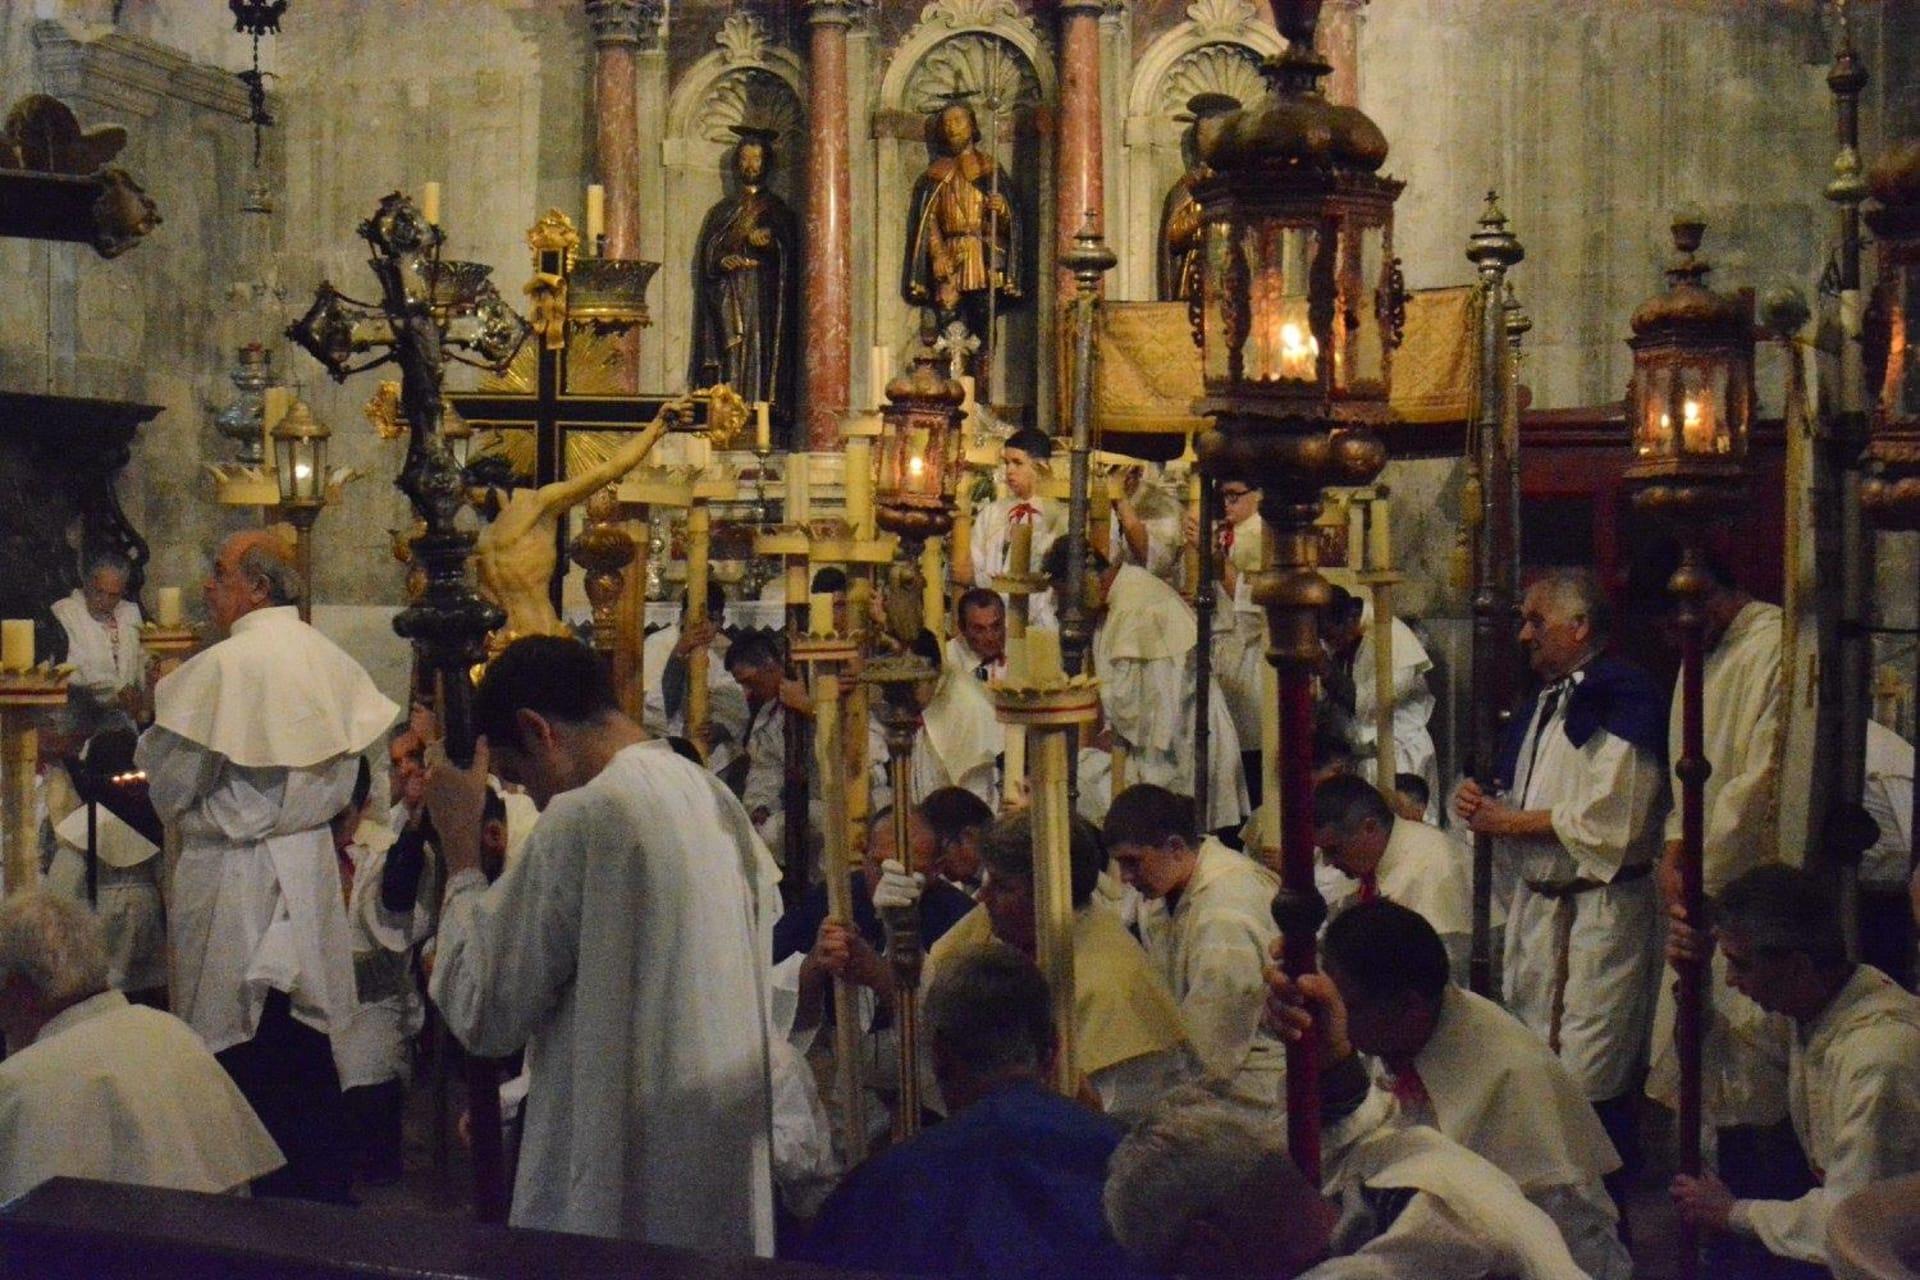 Korcula - Procession Corpus Christi Day